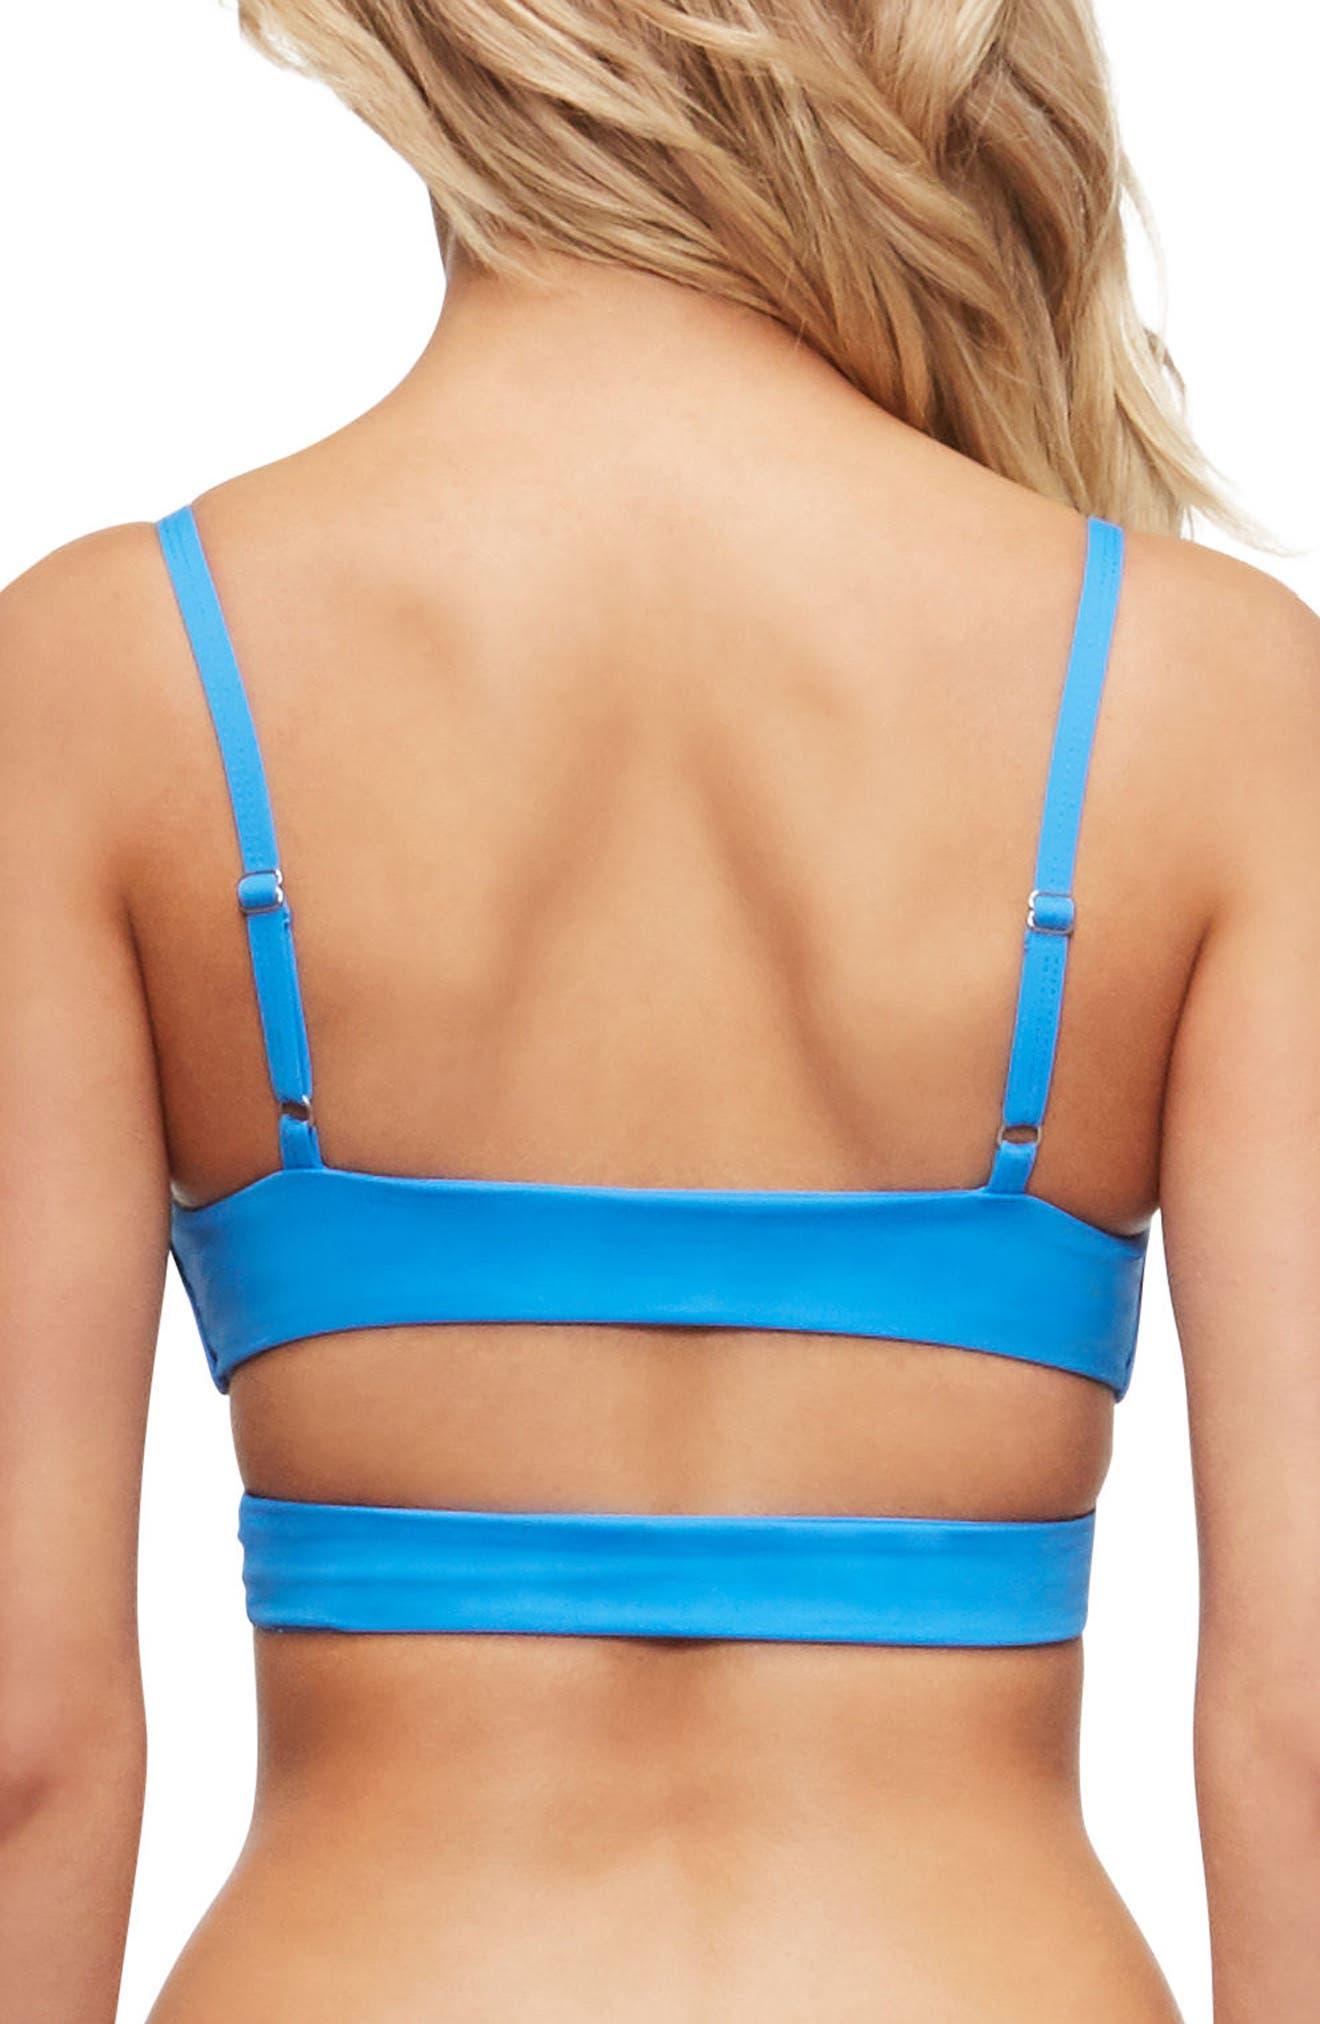 'Jessi' Cutout Triangle Bikini Top,                             Alternate thumbnail 2, color,                             FRENCH BLUE